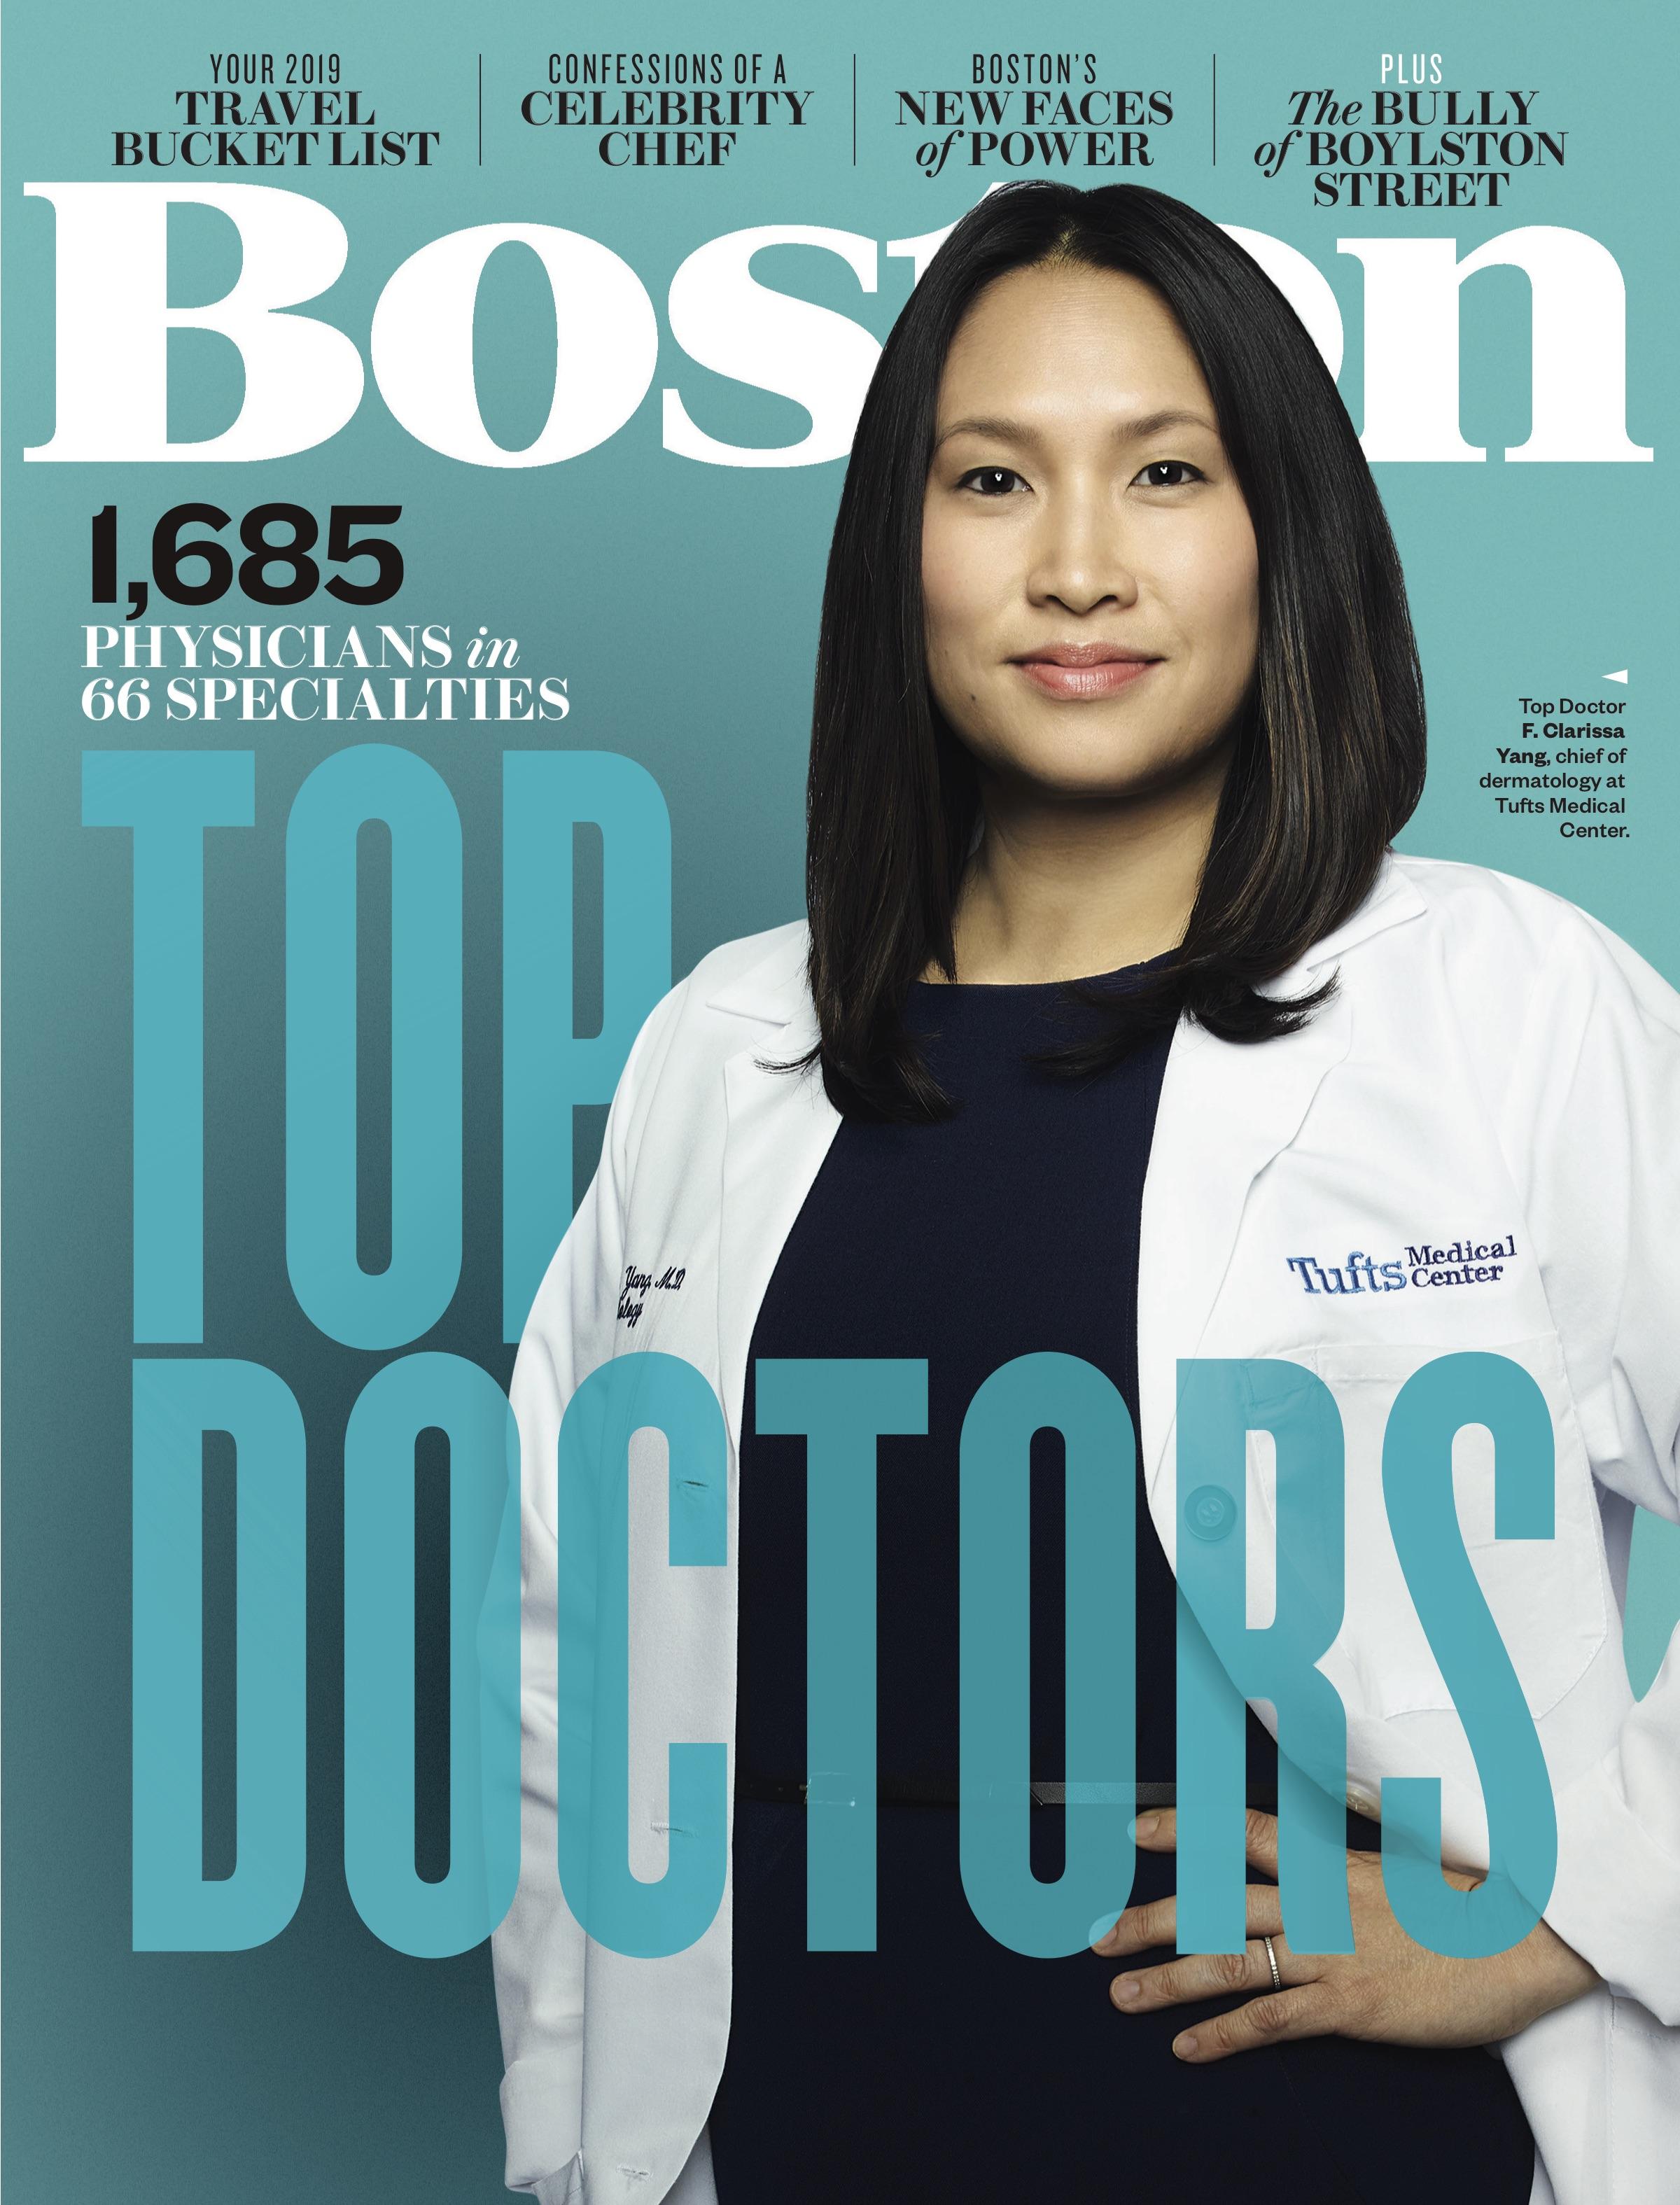 Dr. Taylor Dr. Sullivan Boston magazine topdocs plastic surgeons.jpg